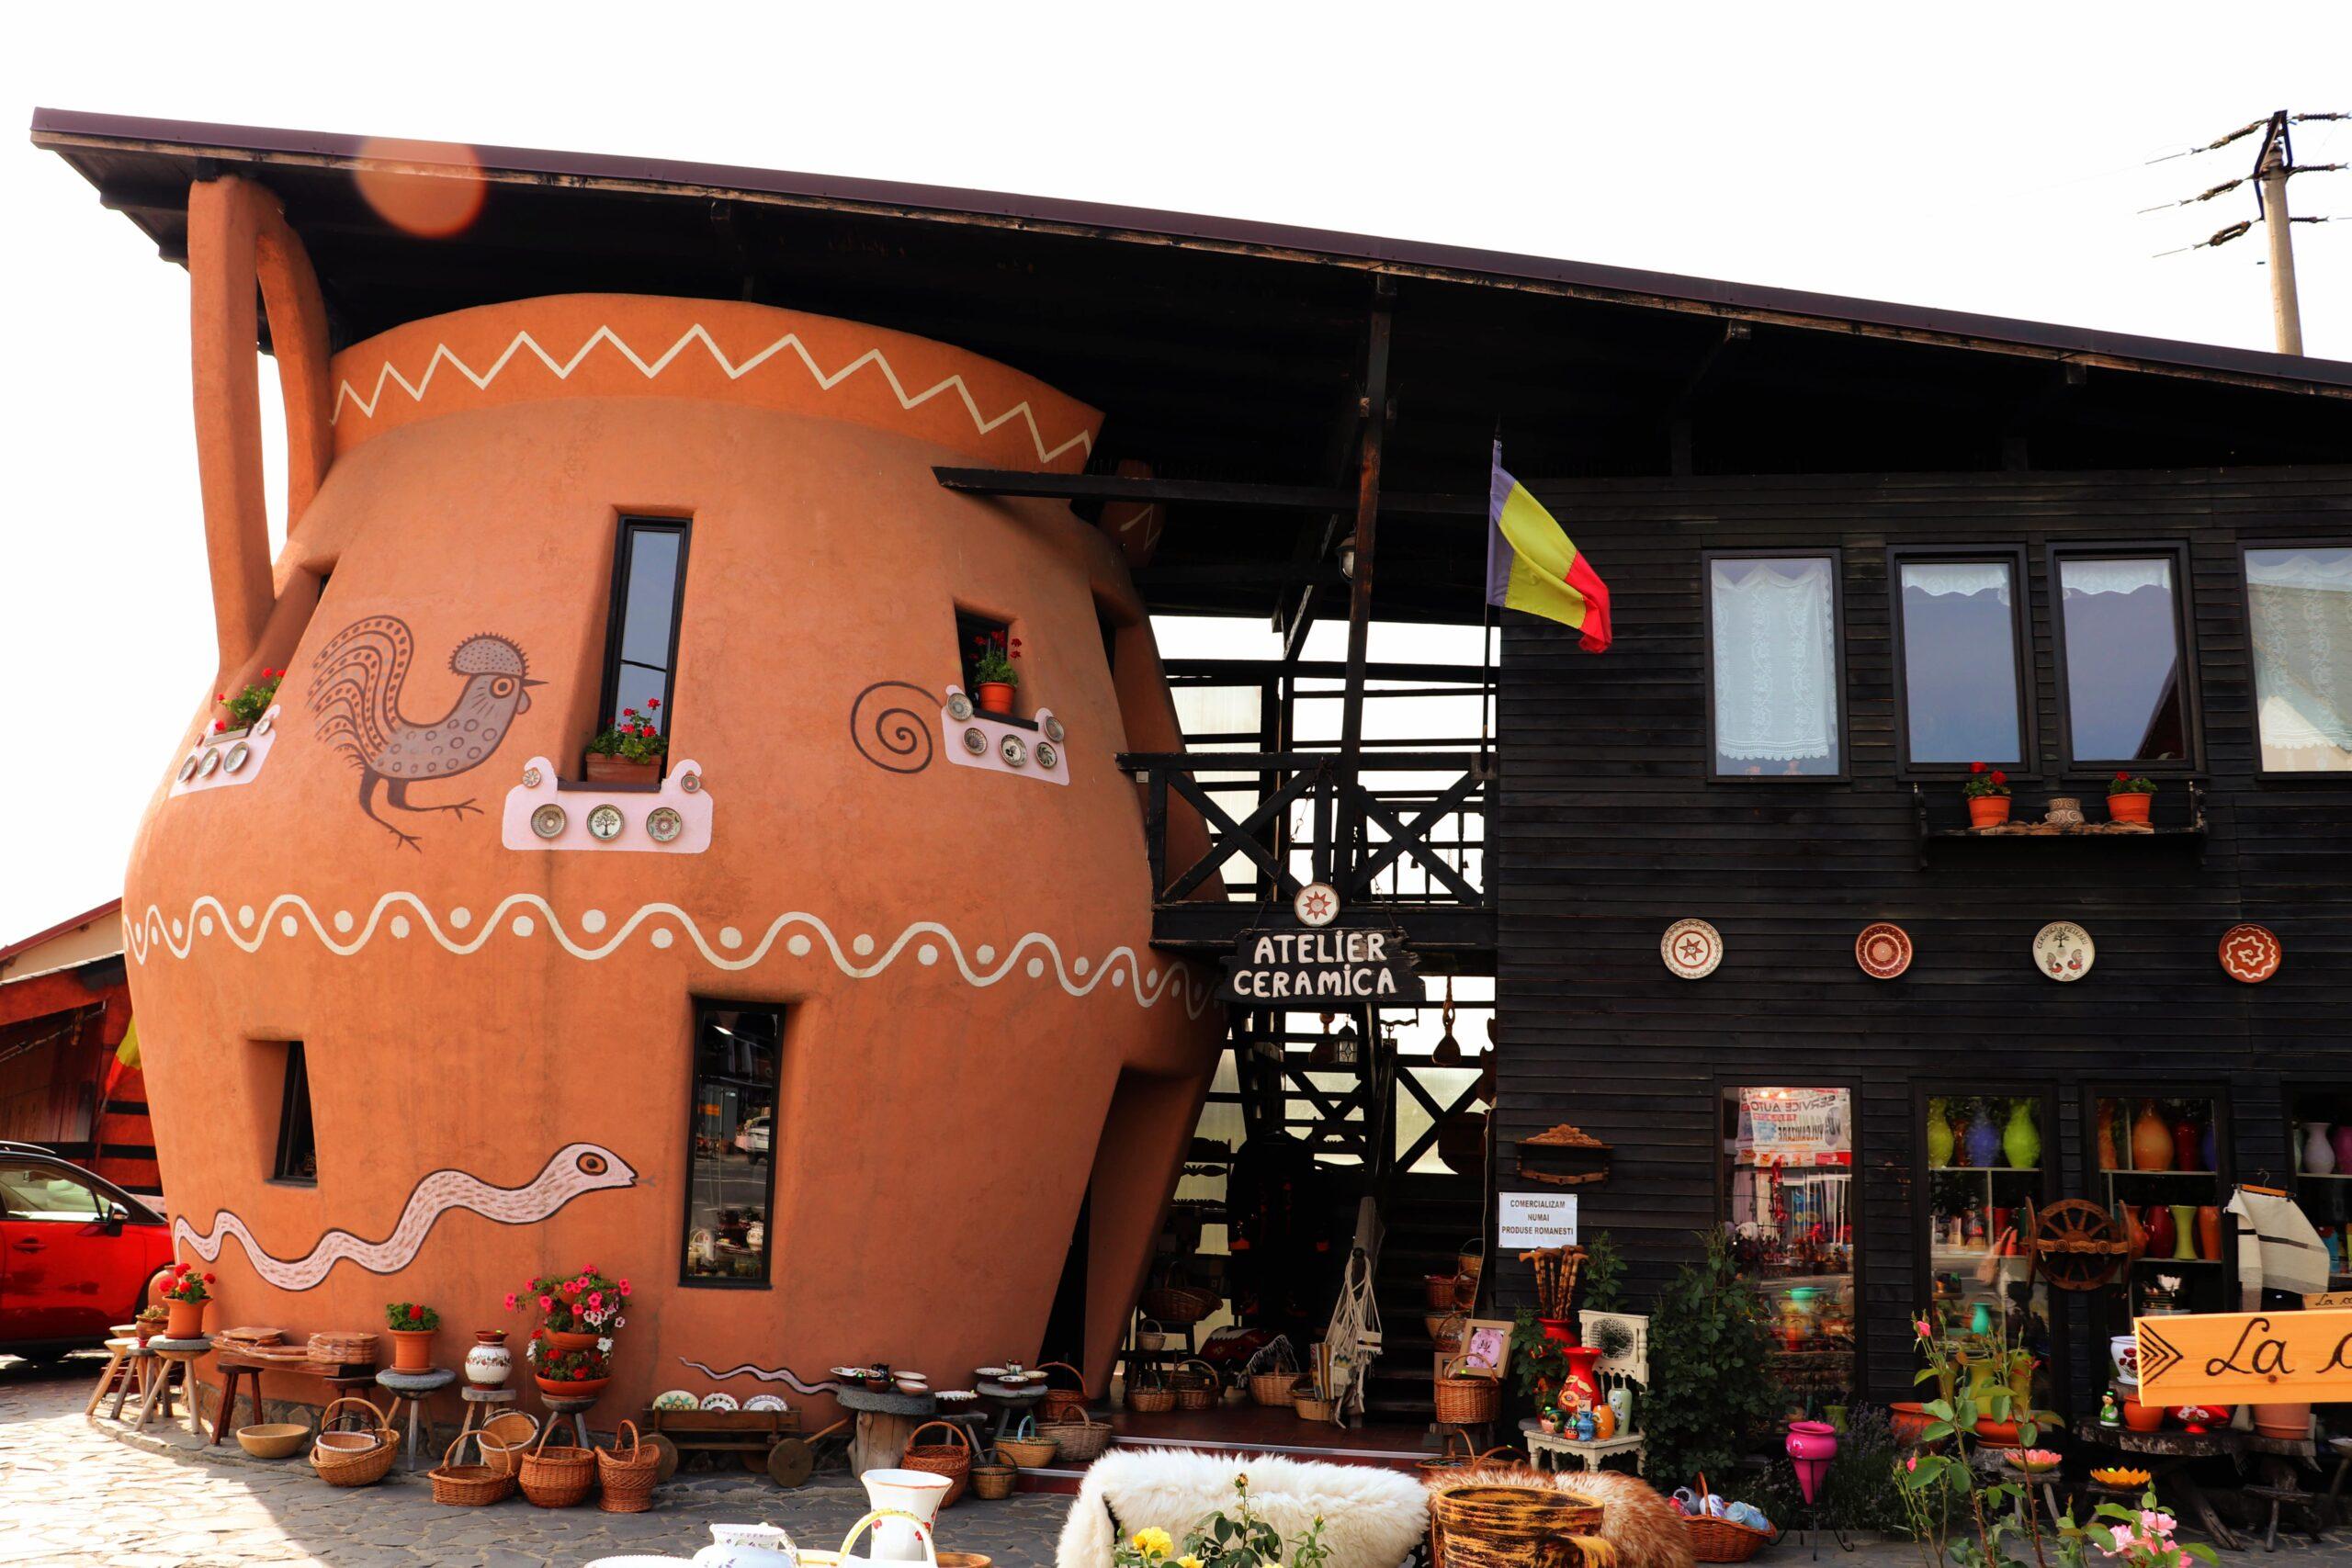 day-trip-horezu-atelier-ceramica